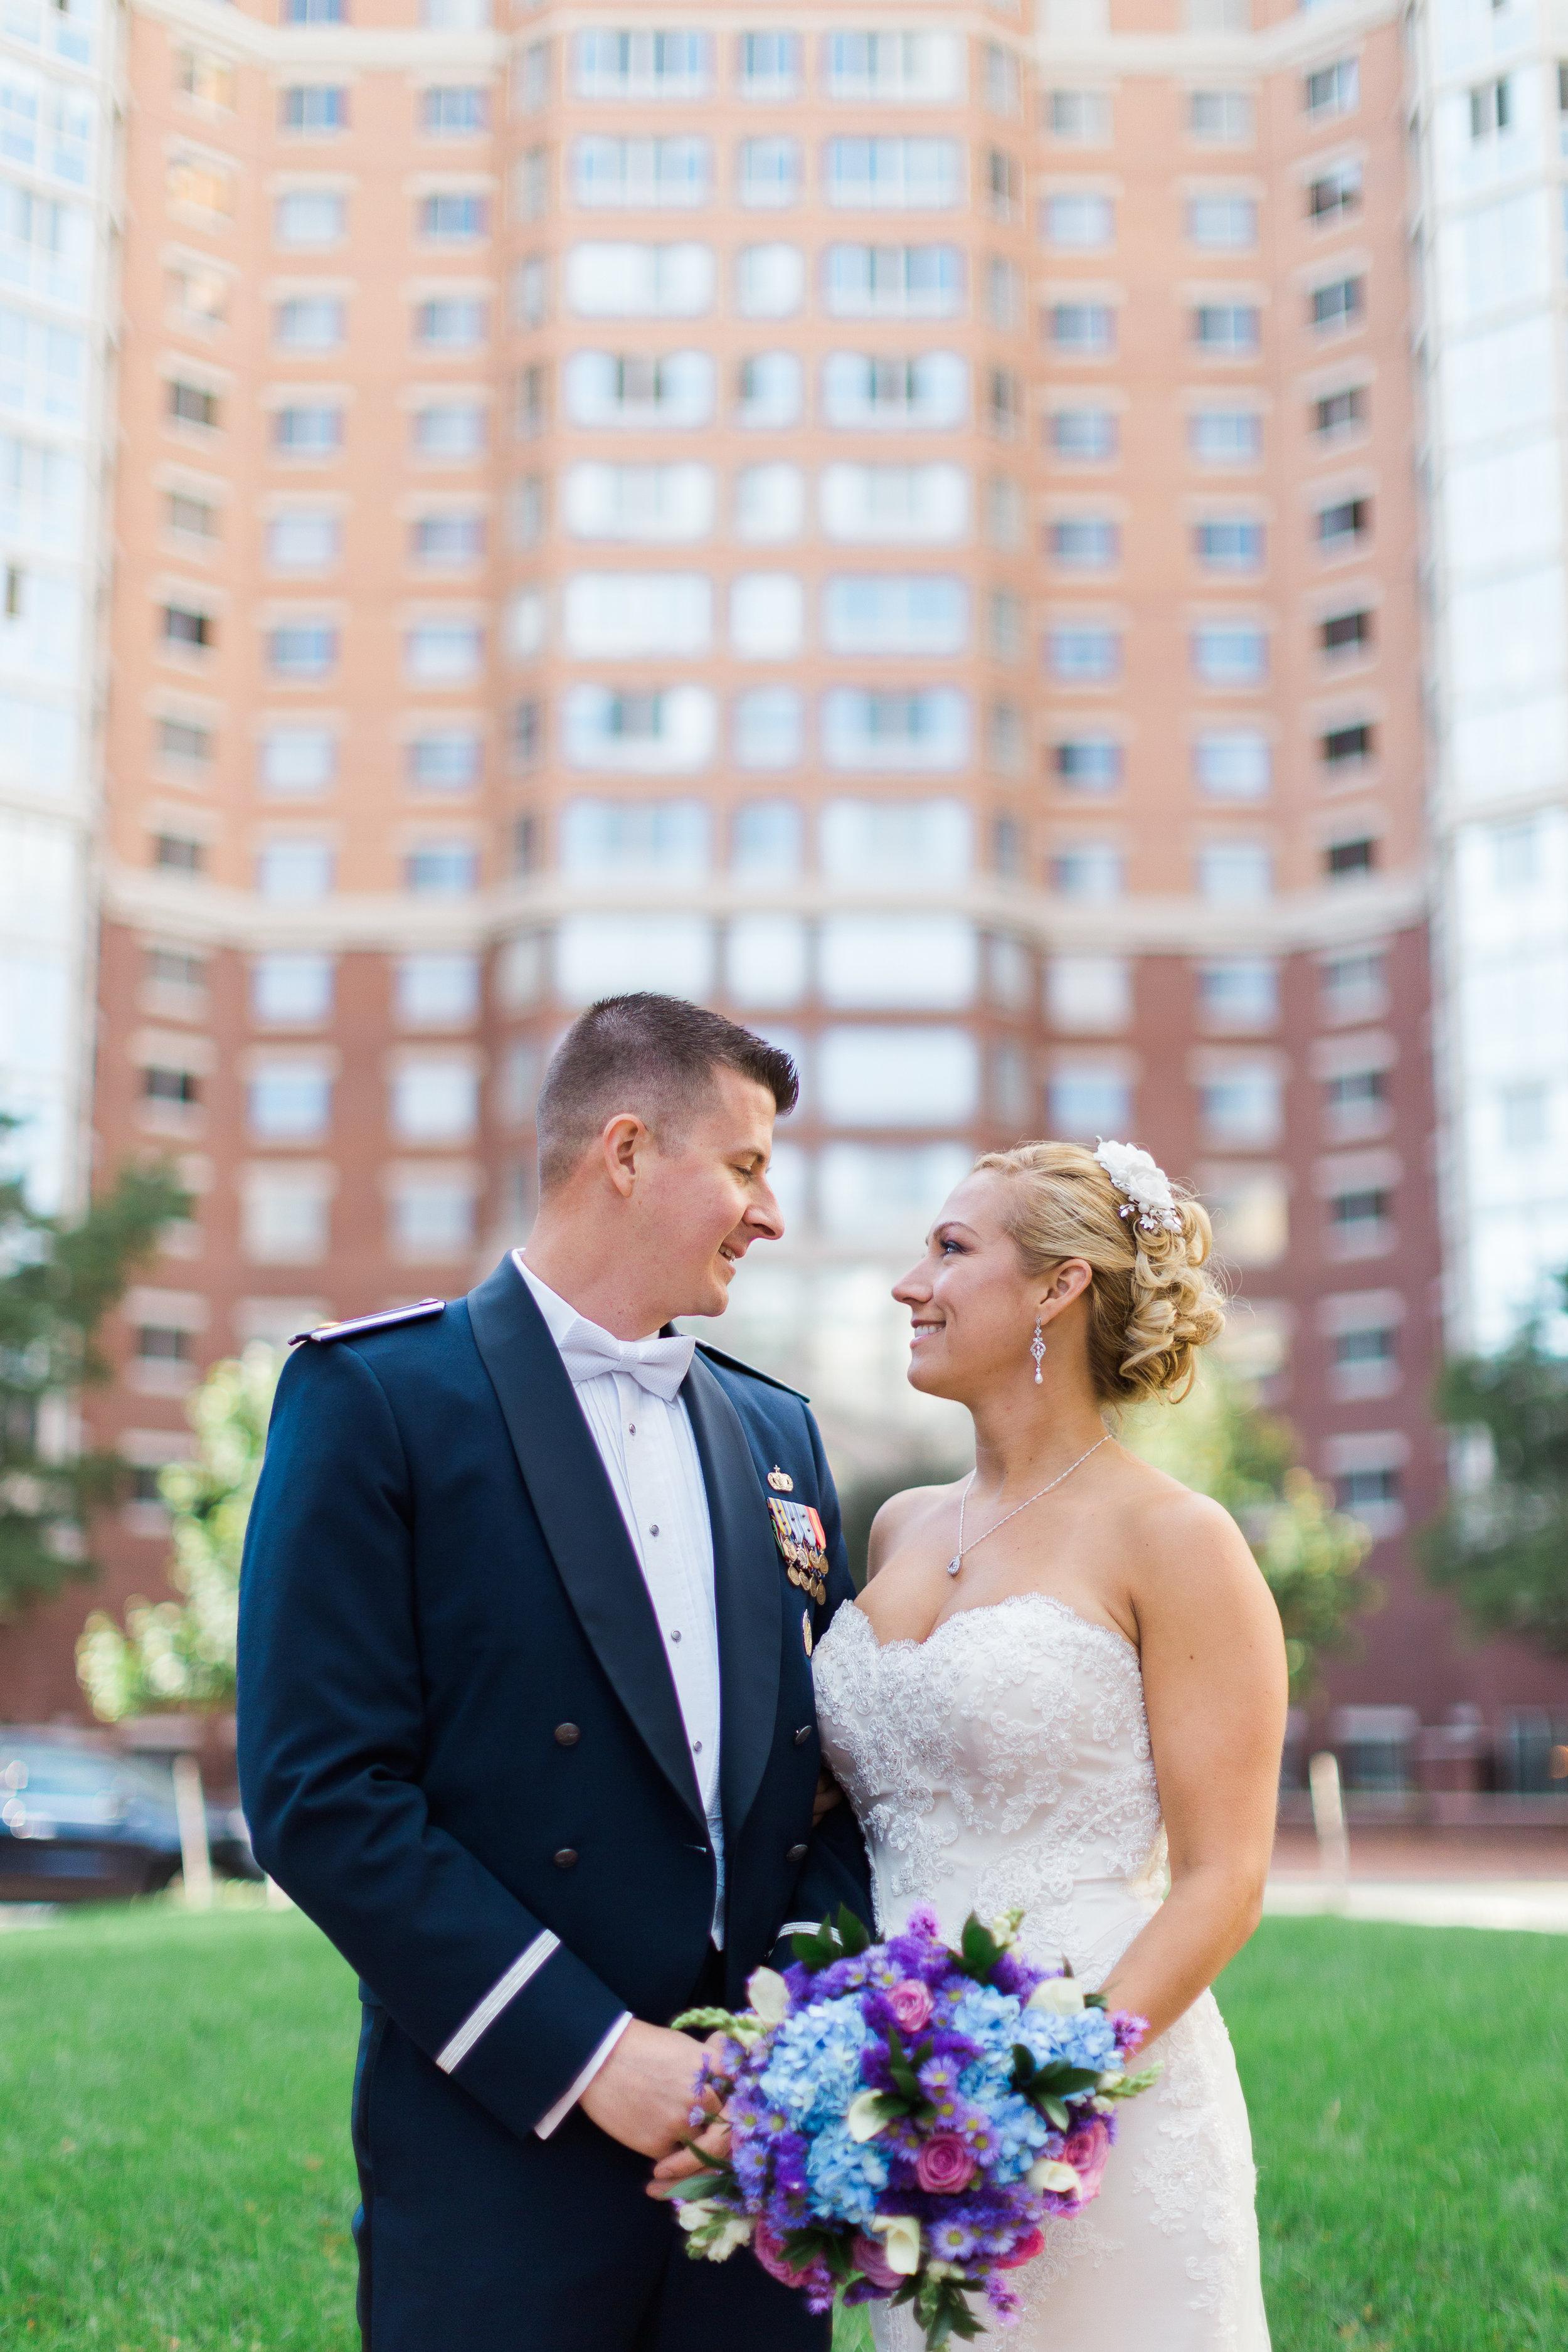 Jessica & Steve Cicchetto Bride and Groom Portraits-2169.jpg